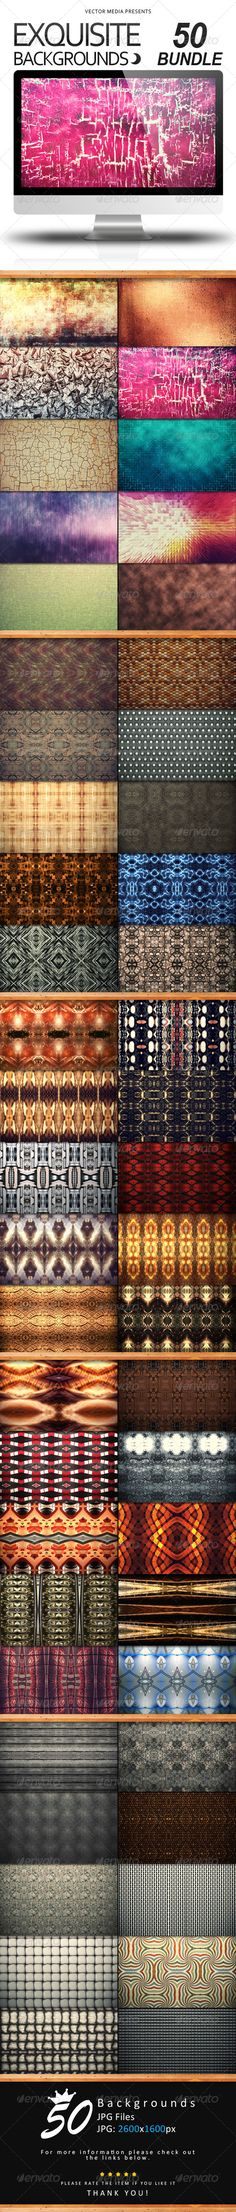 Exquisite Backgrounds - Bundle